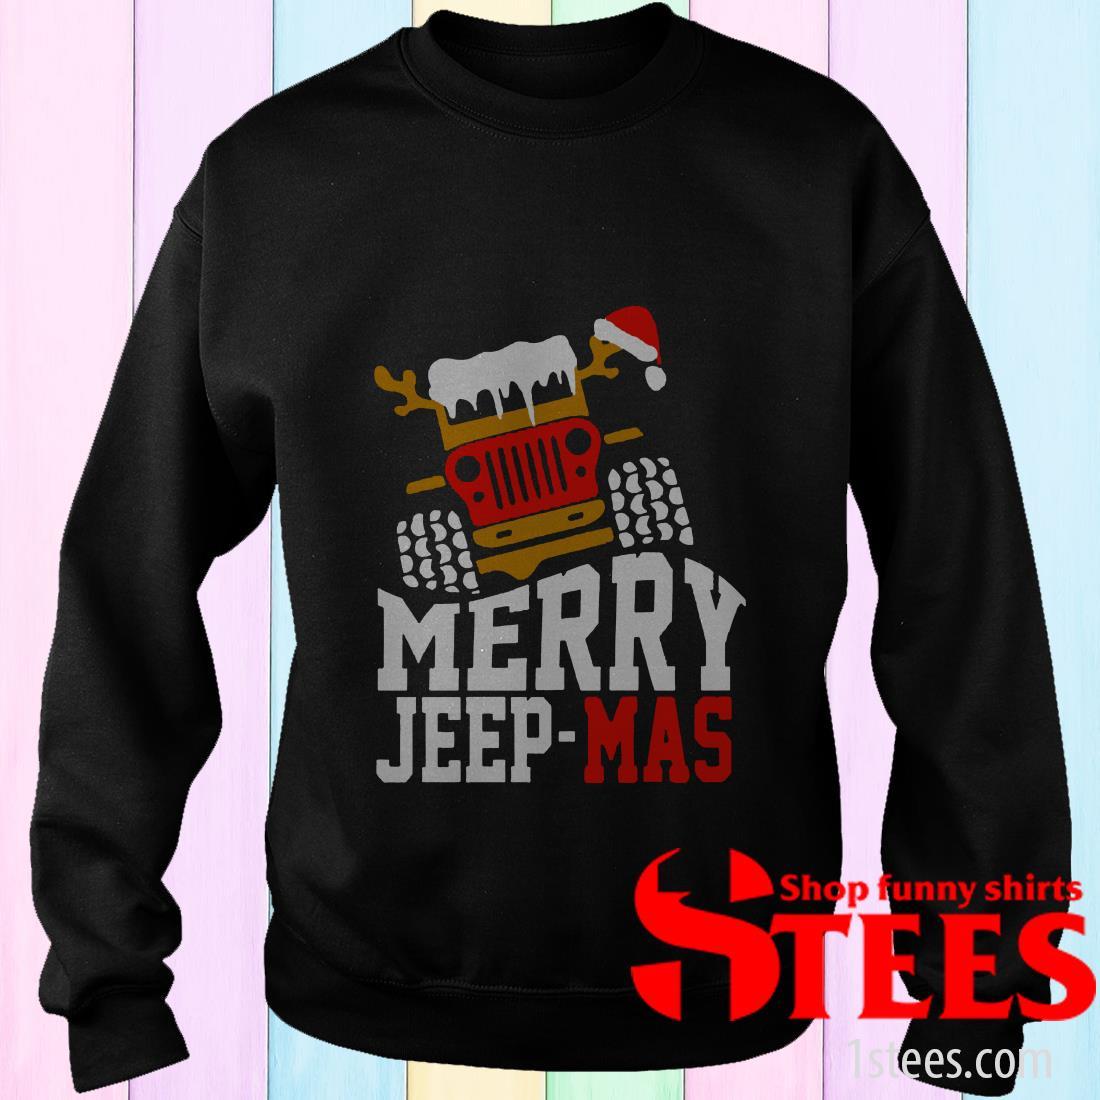 Merry Jeep Mas Sweatshirt